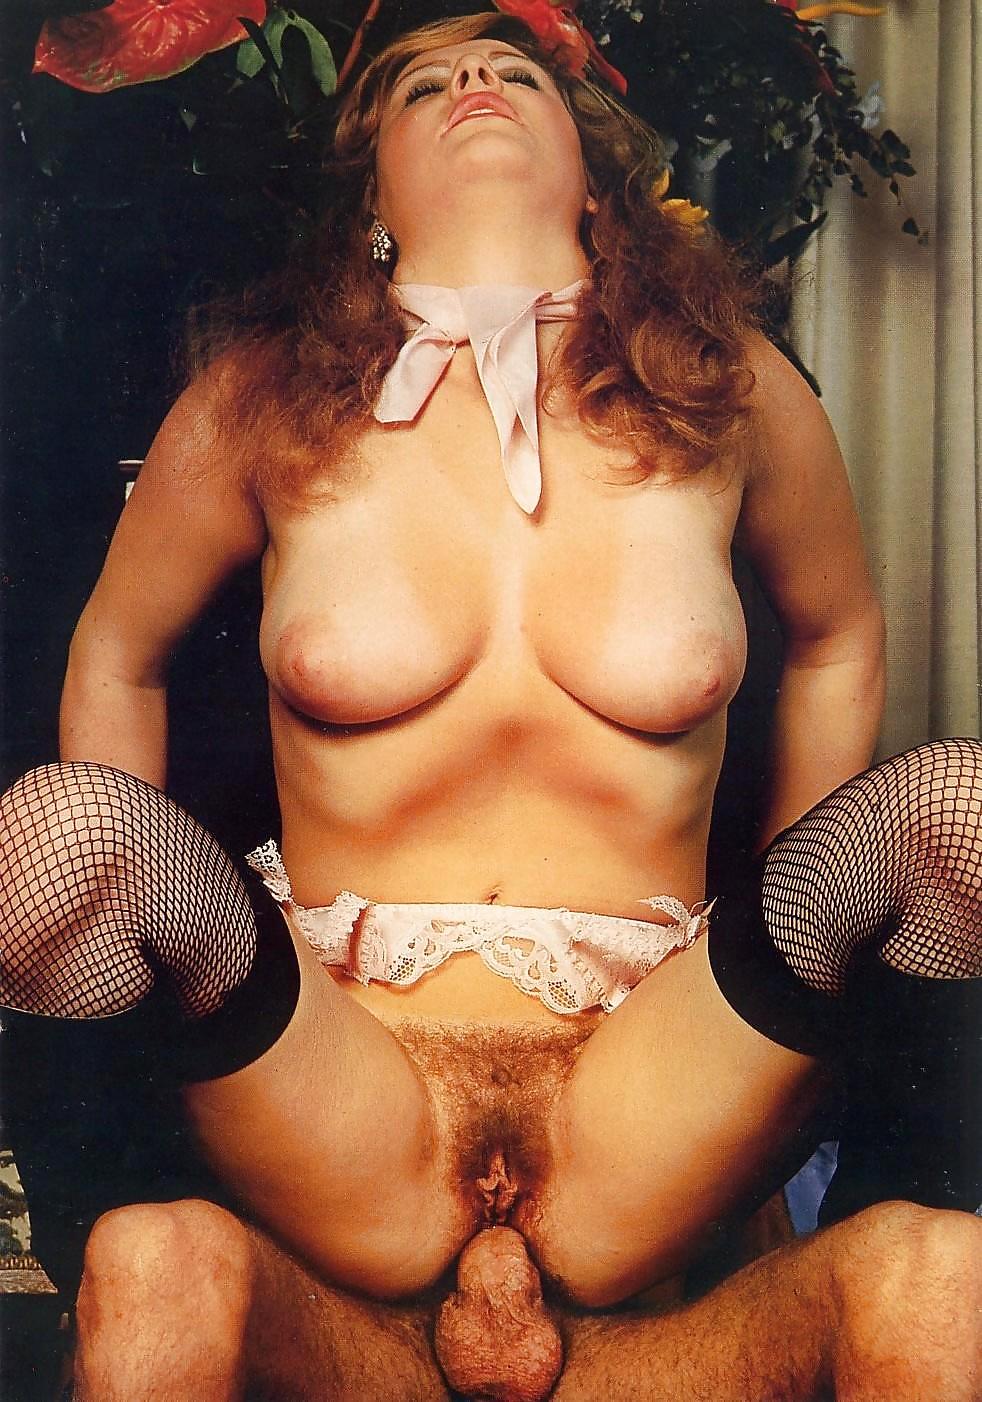 Vintage erotic fuckpics, naked girl irish